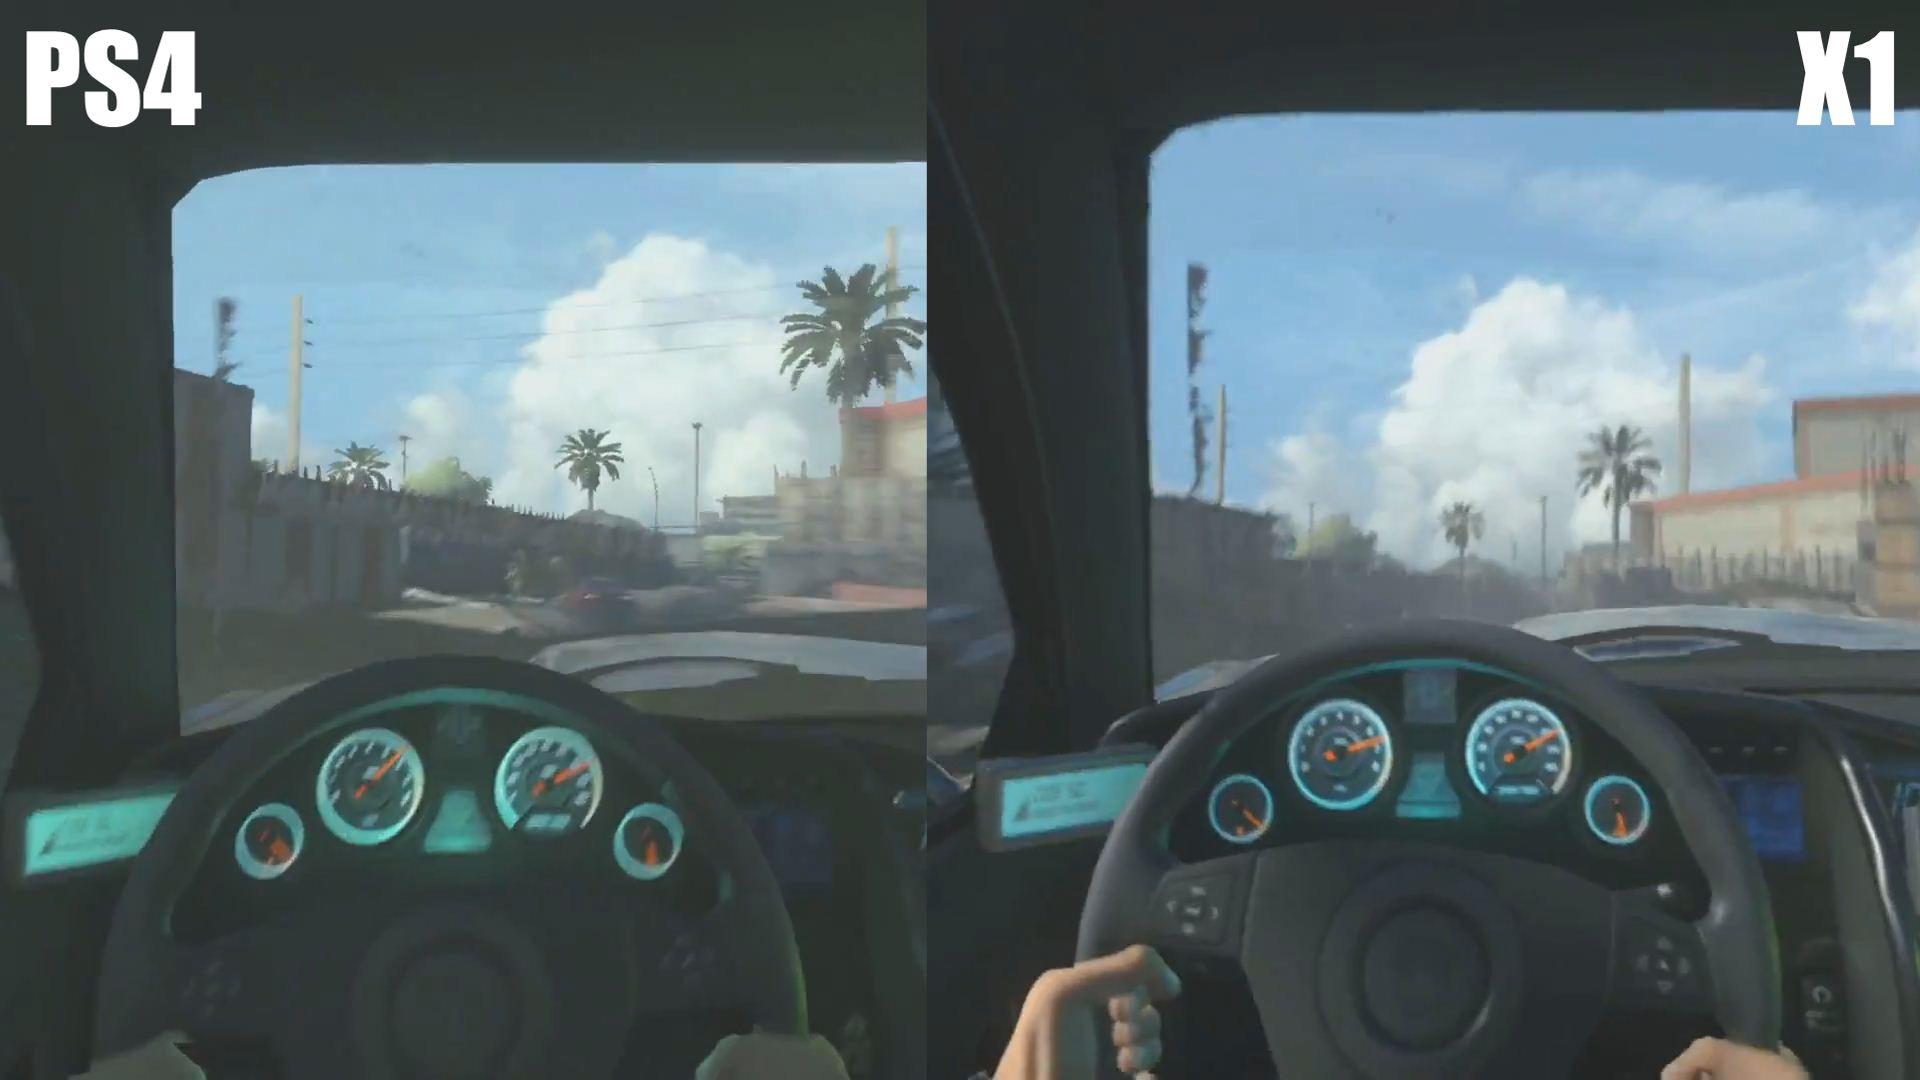 Battlefield Hardline Visual Analysis: PS4 vs. Xbox One vs. PC